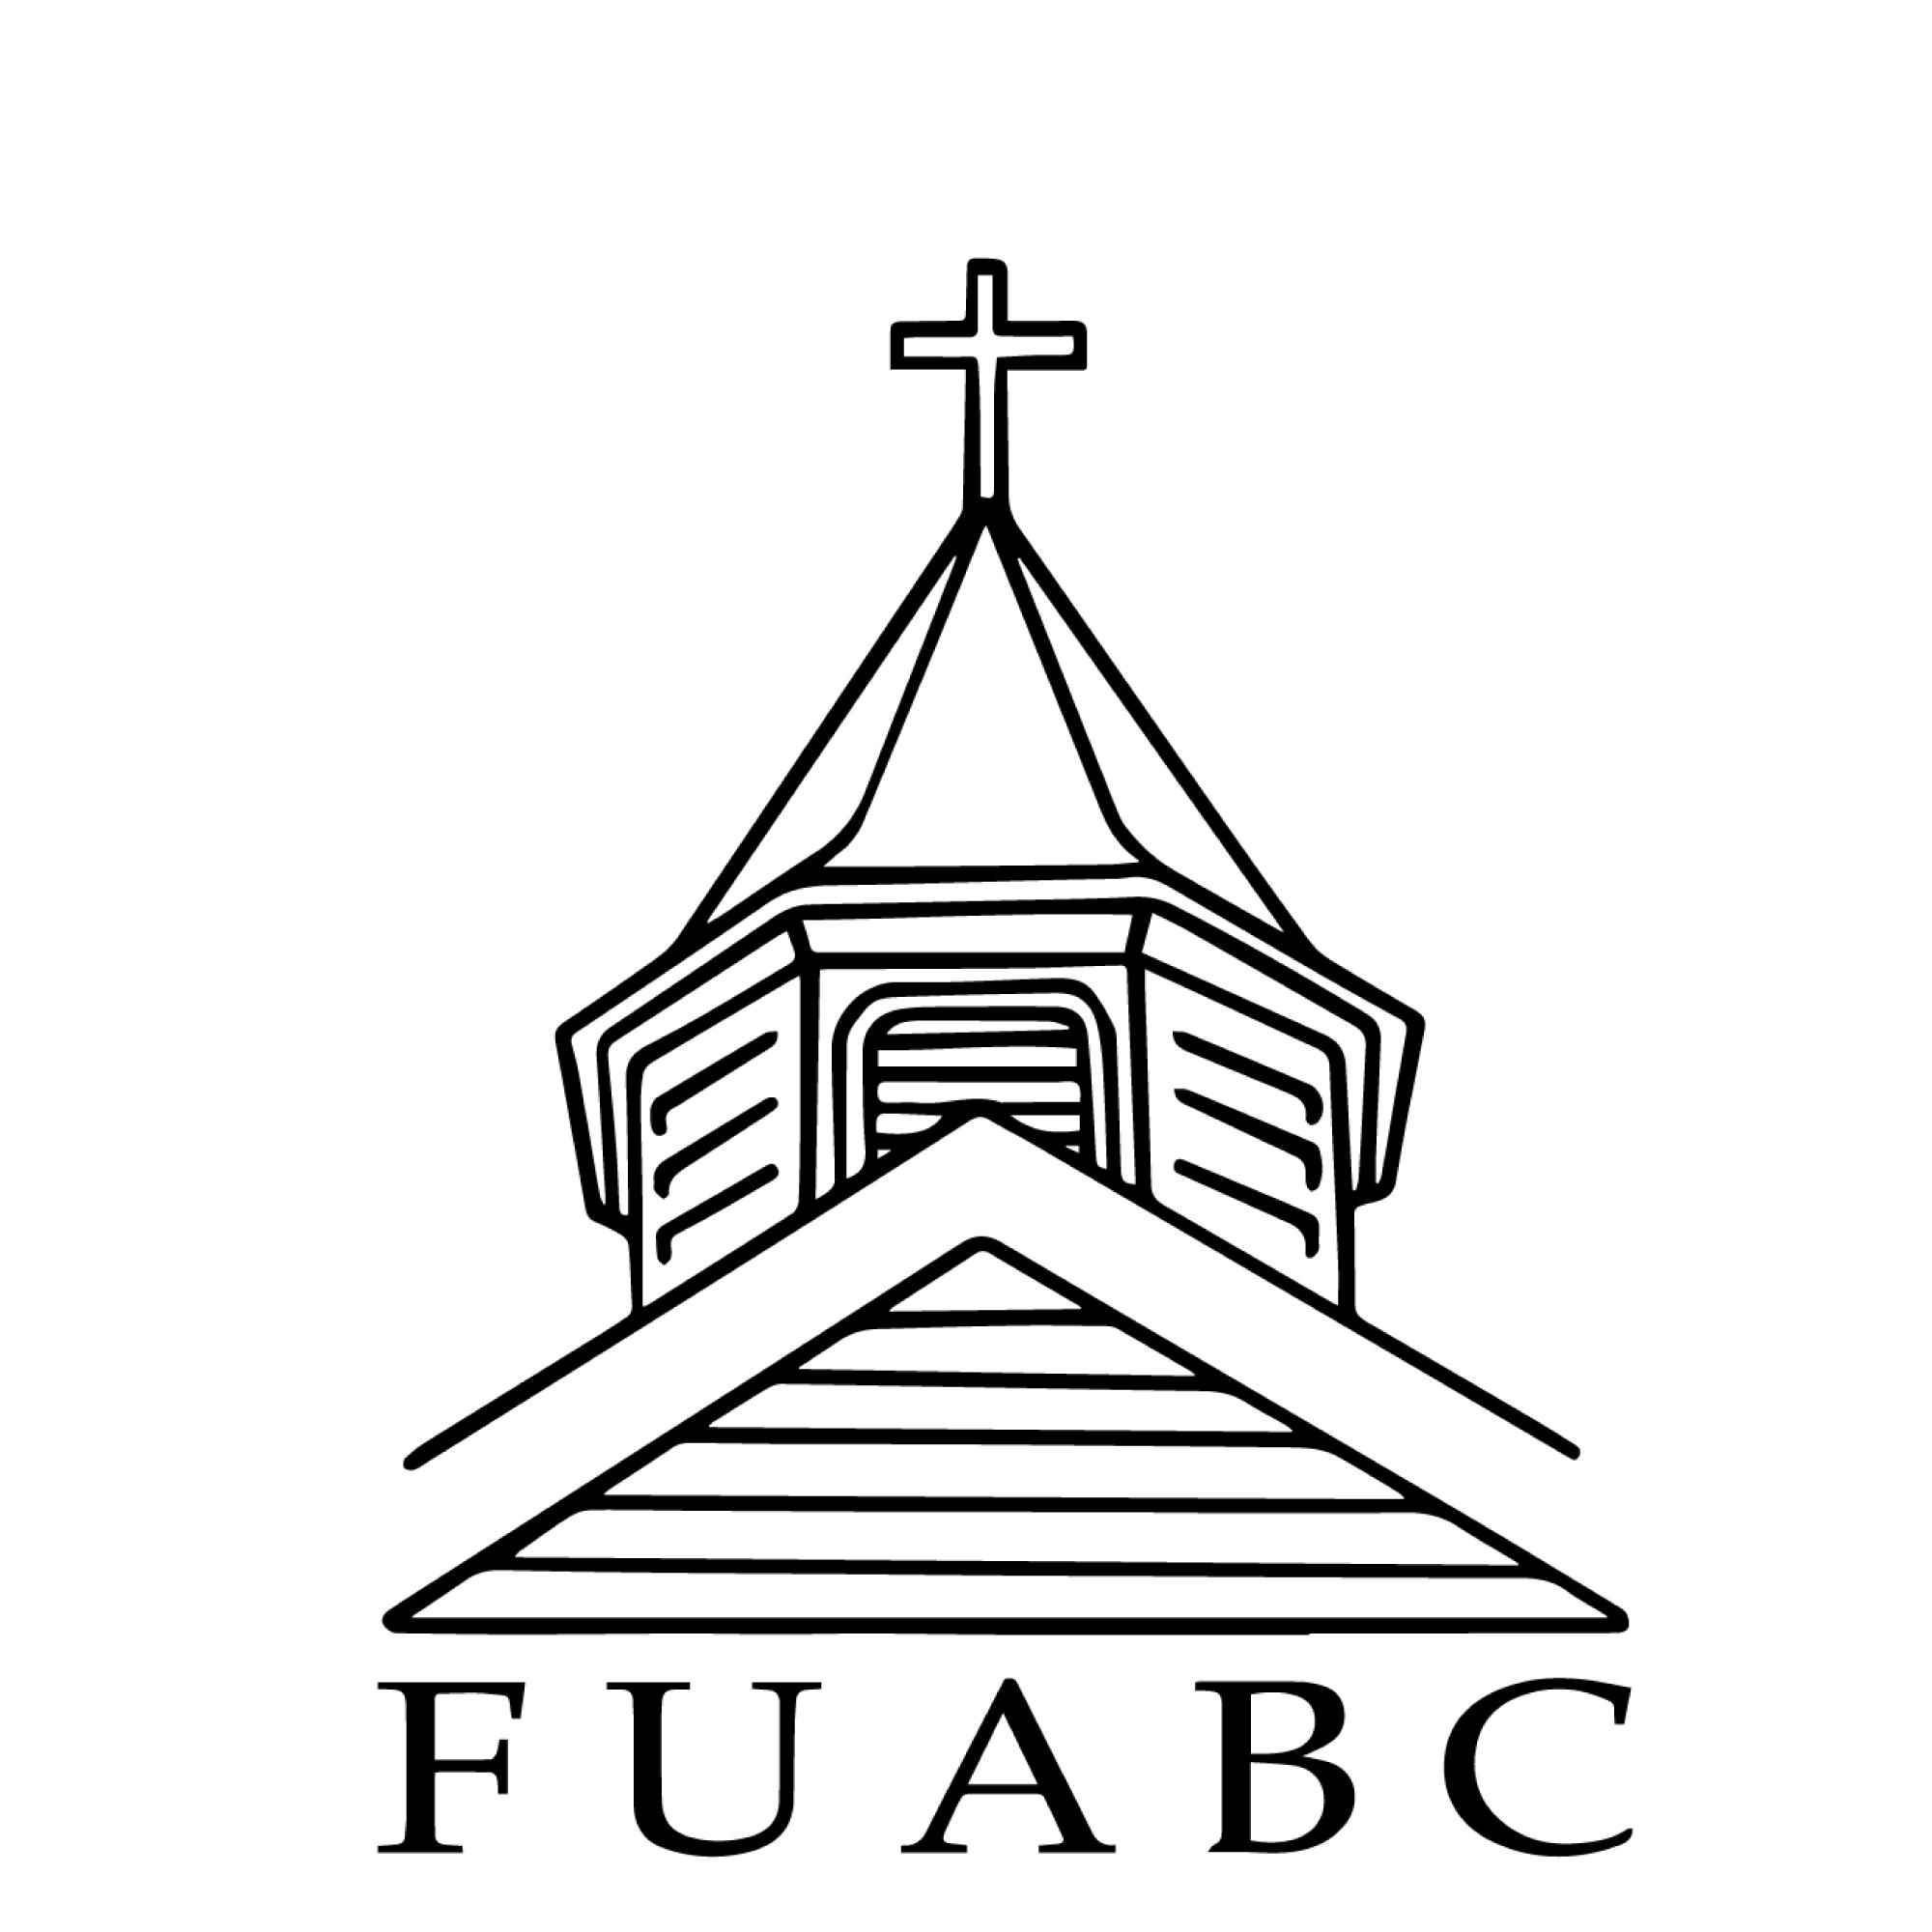 First Union African Baptist Church